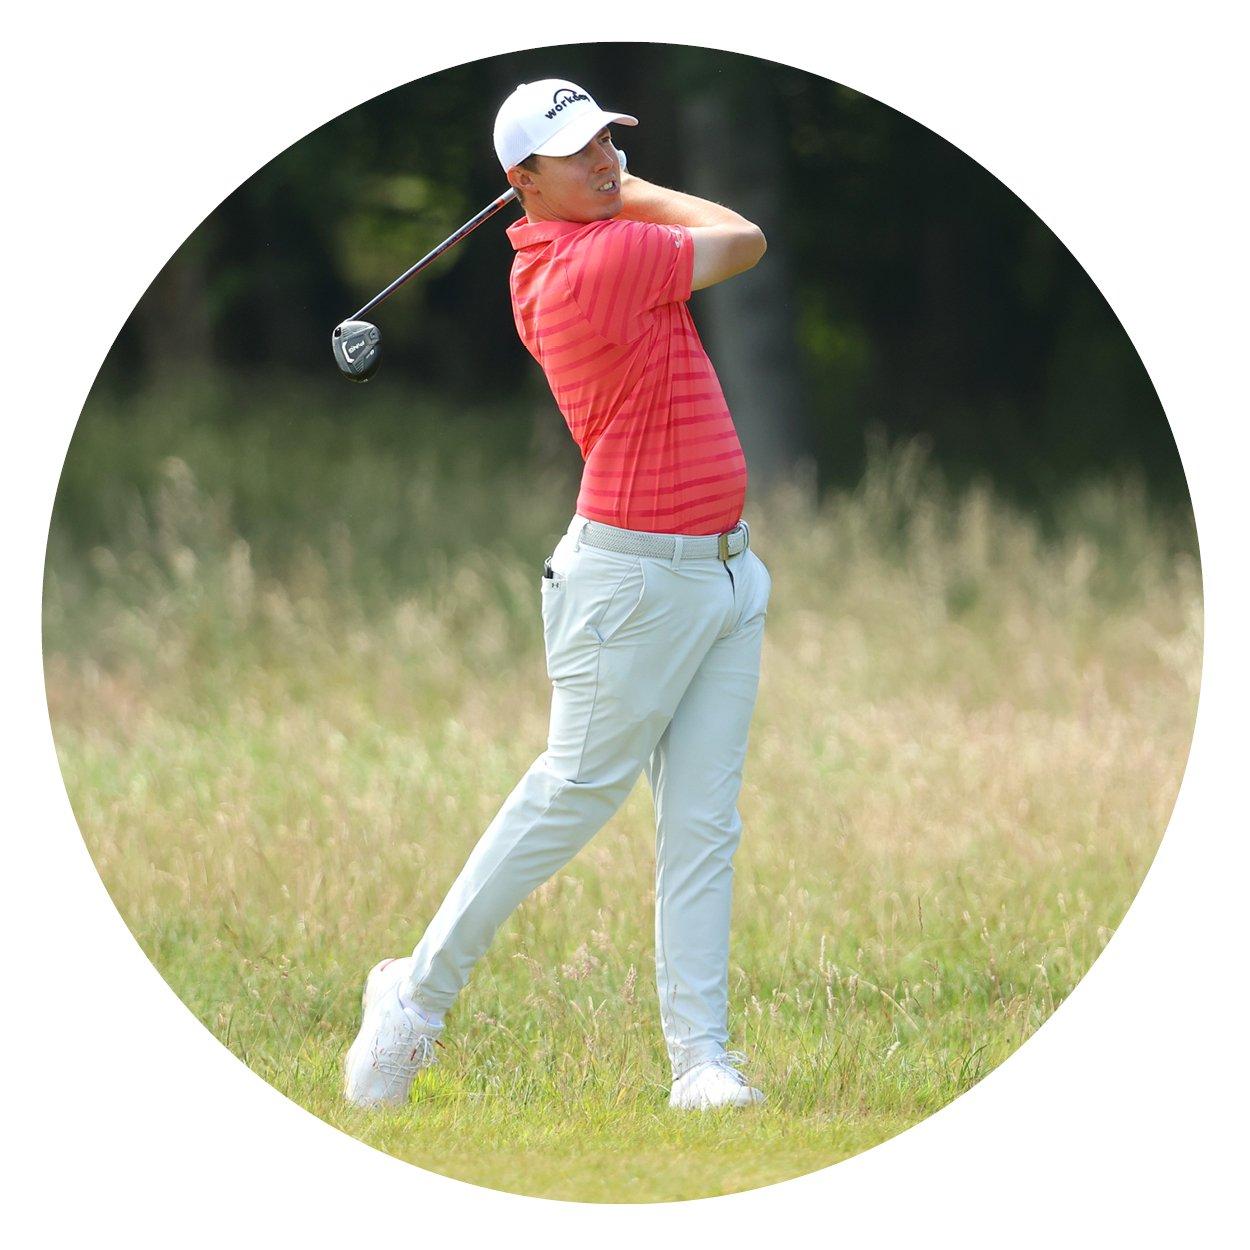 Category: Golf